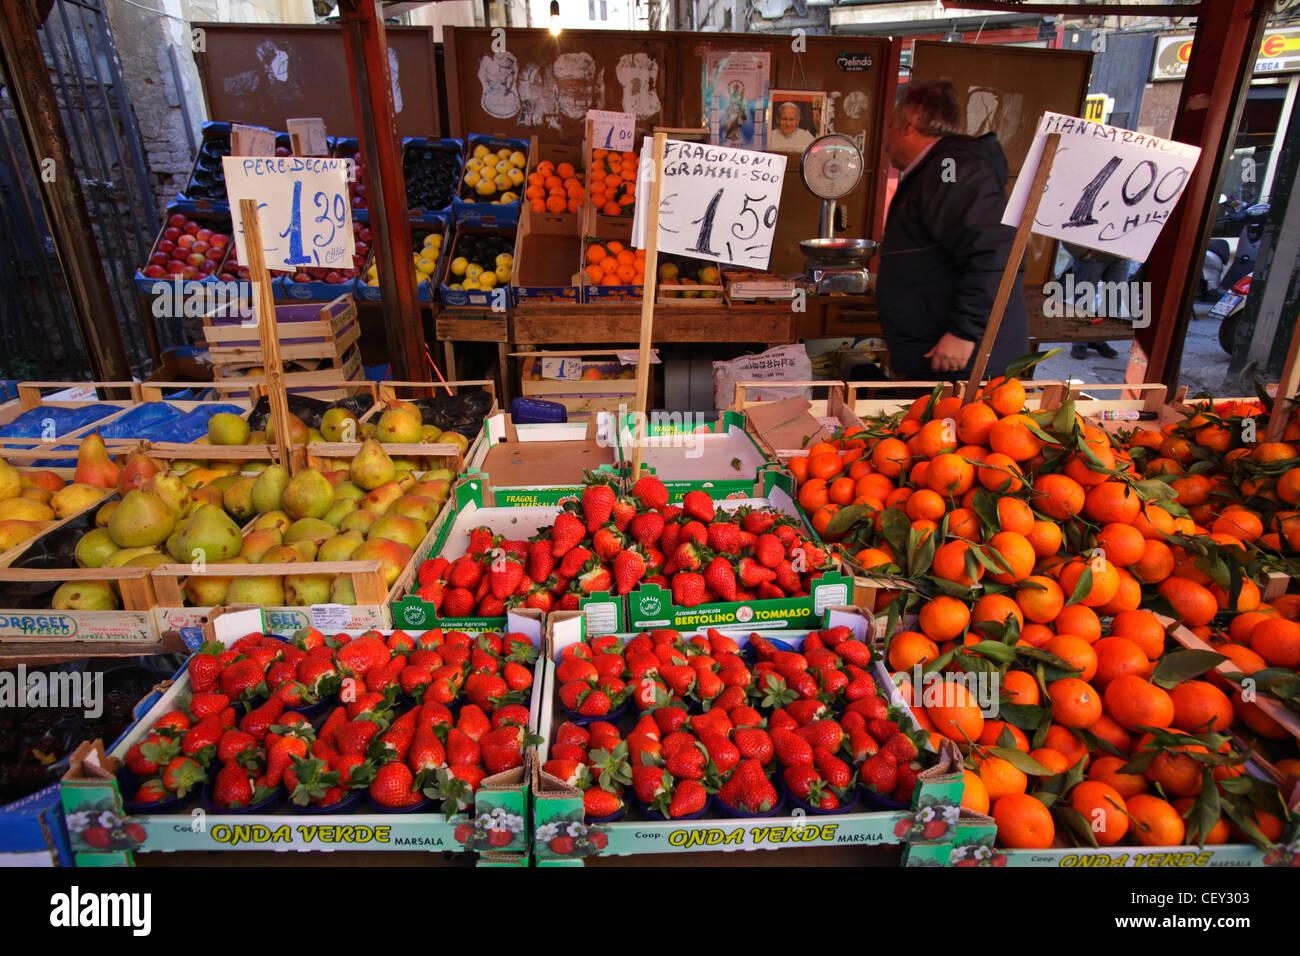 Fruits at Ballarò market, Palermo, Italy - Stock Image